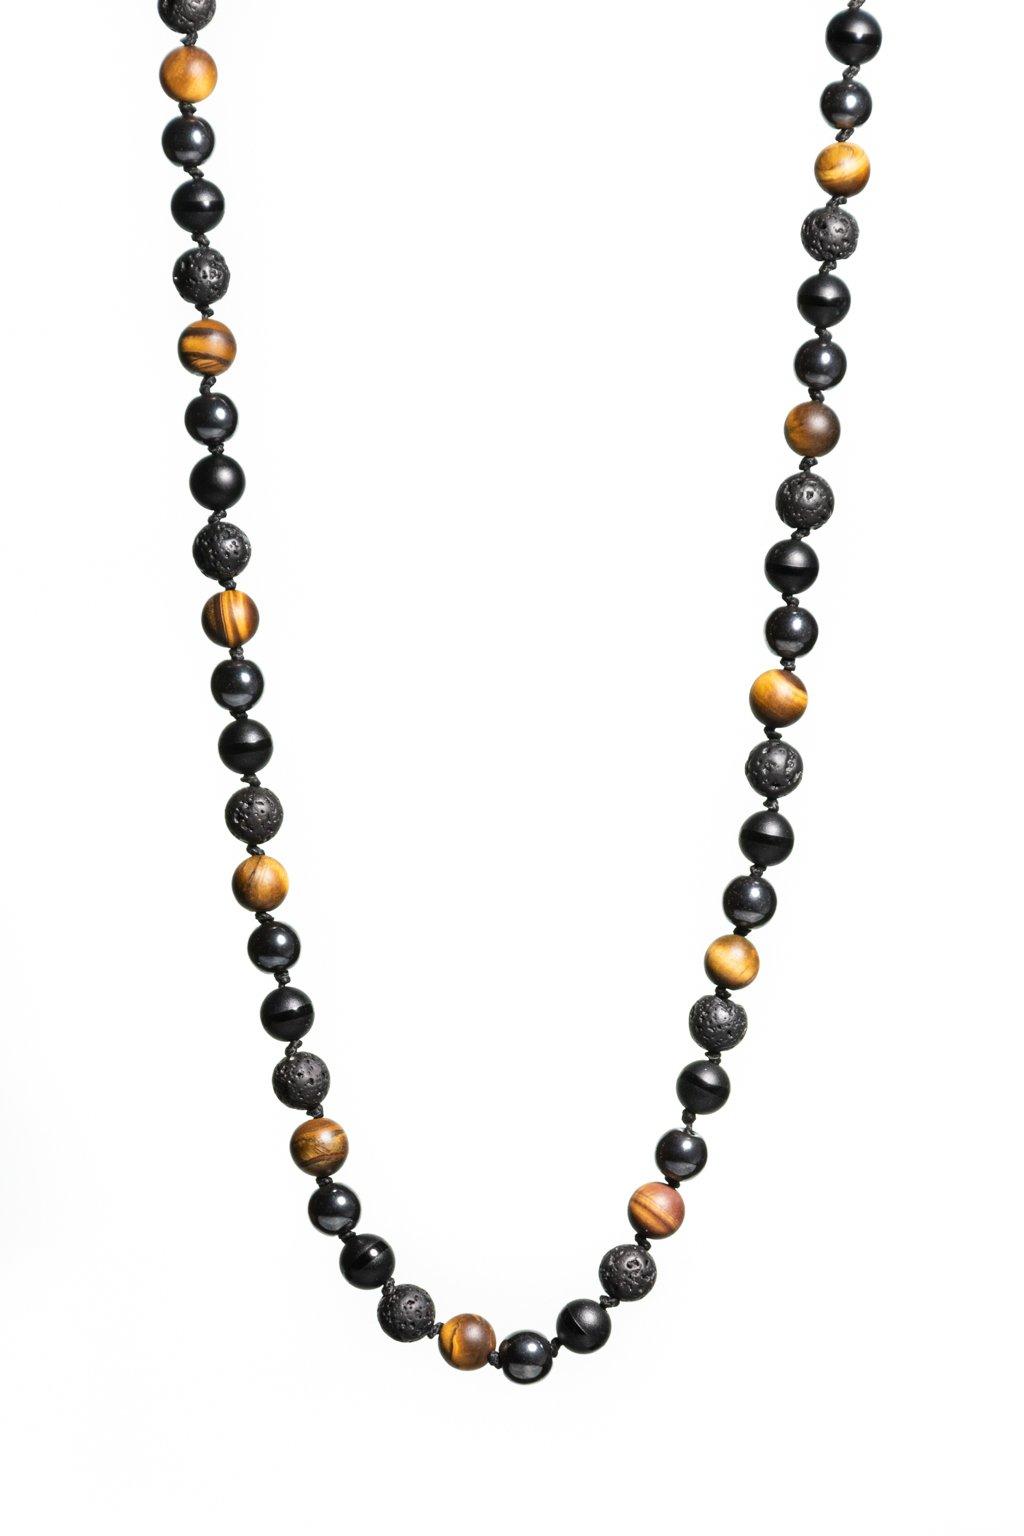 Pánsky náhrdelník NAJOBĽÚBENEJŠÍ MIX z minerálov ACHÁT, HEMATIT, TIGRIE OKO, LÁVA